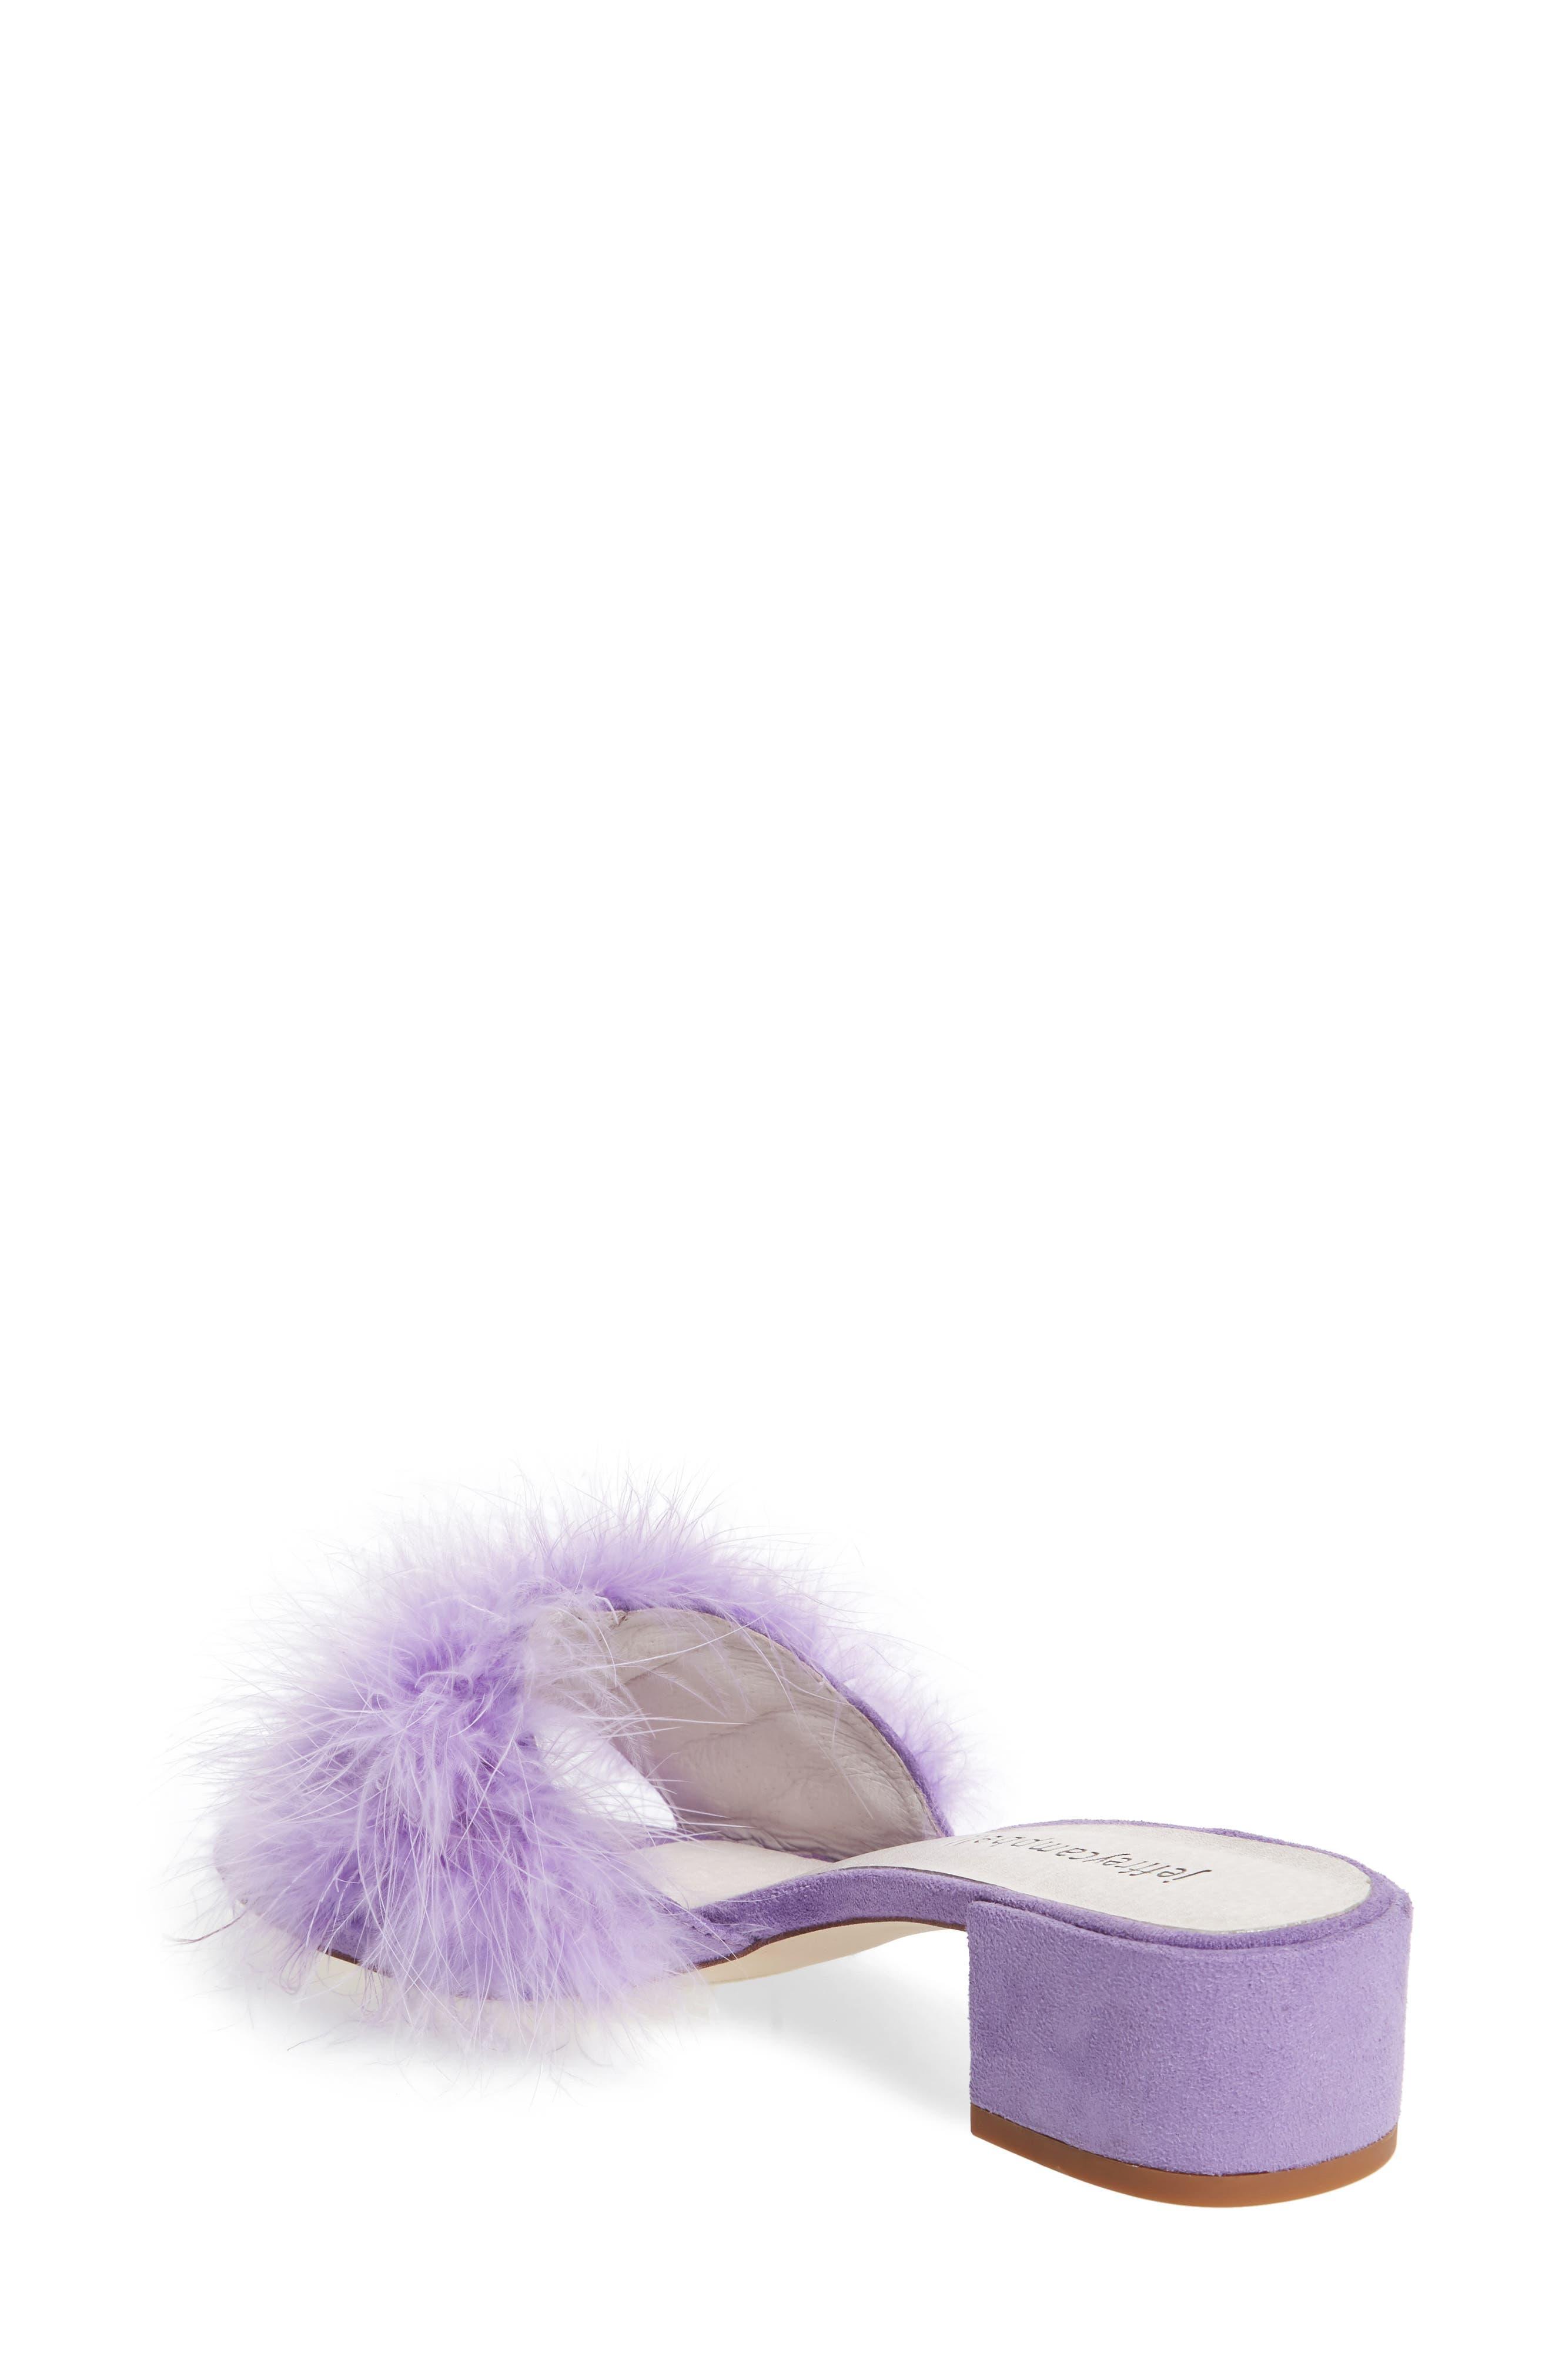 'Beaton' Slide Sandal,                             Alternate thumbnail 2, color,                             Lilac Suede